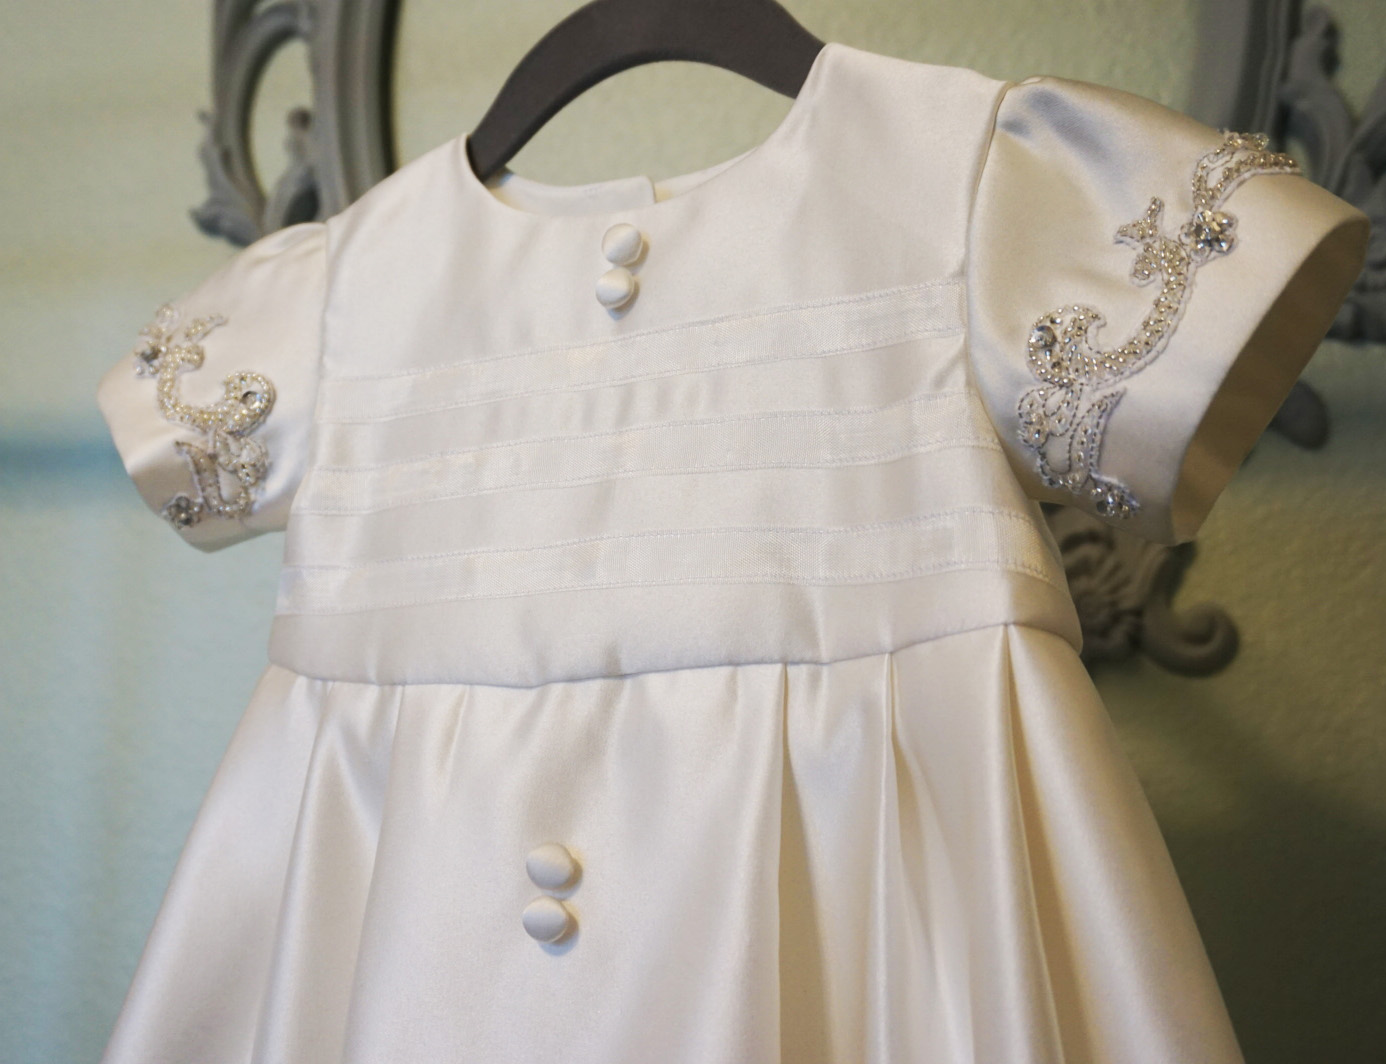 Aux Belles Choses: Wedding Dress to Baptismal Gown